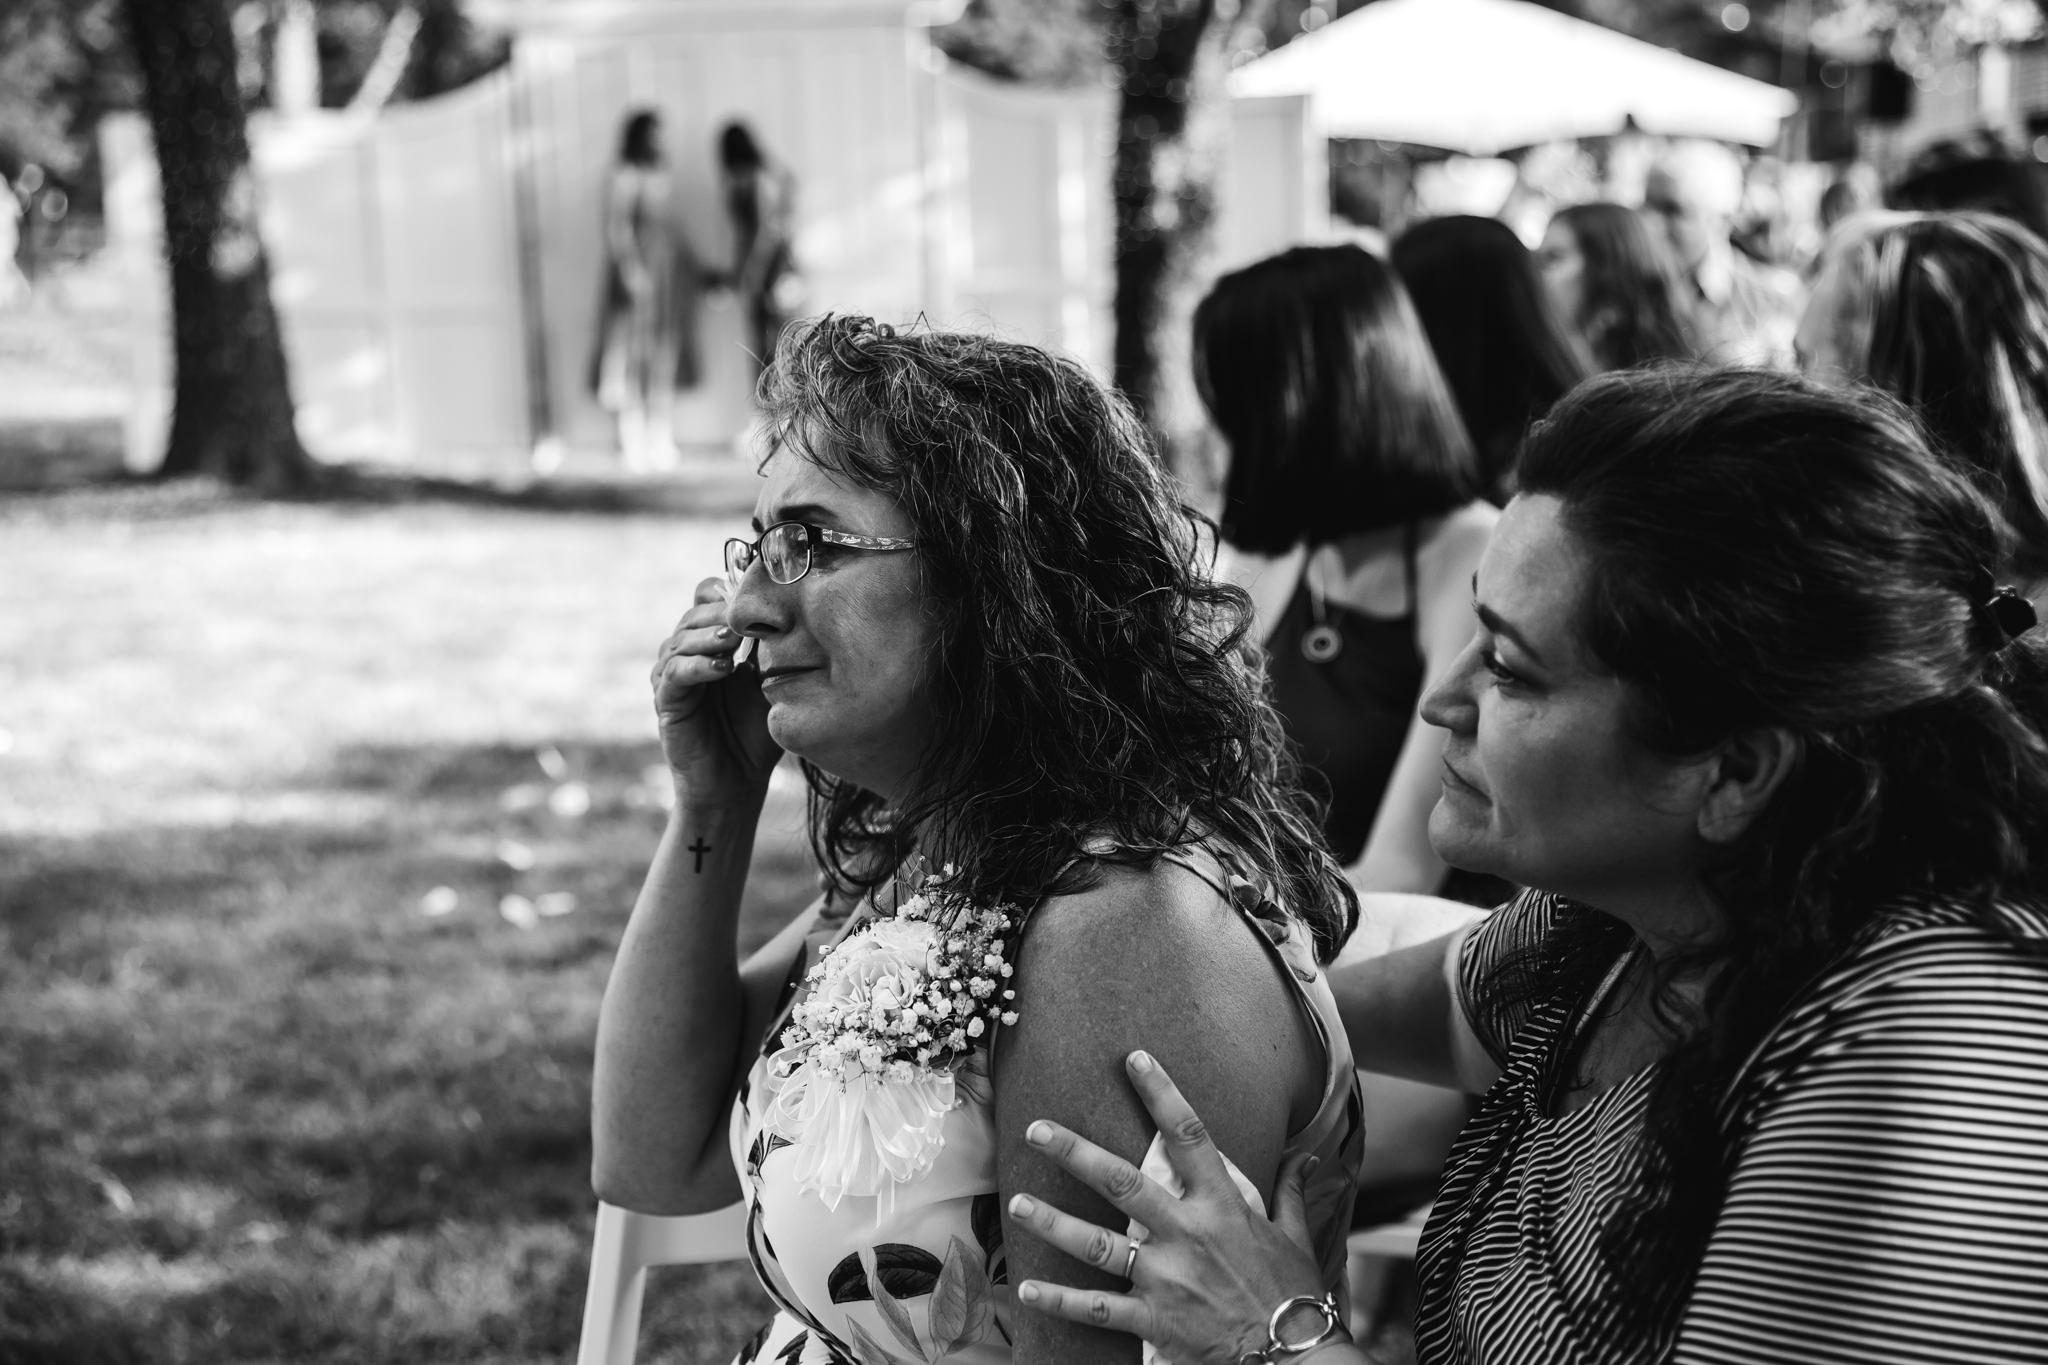 zbackyard-wedding-thewarmtharoundyou-lexy-branson-7.jpg